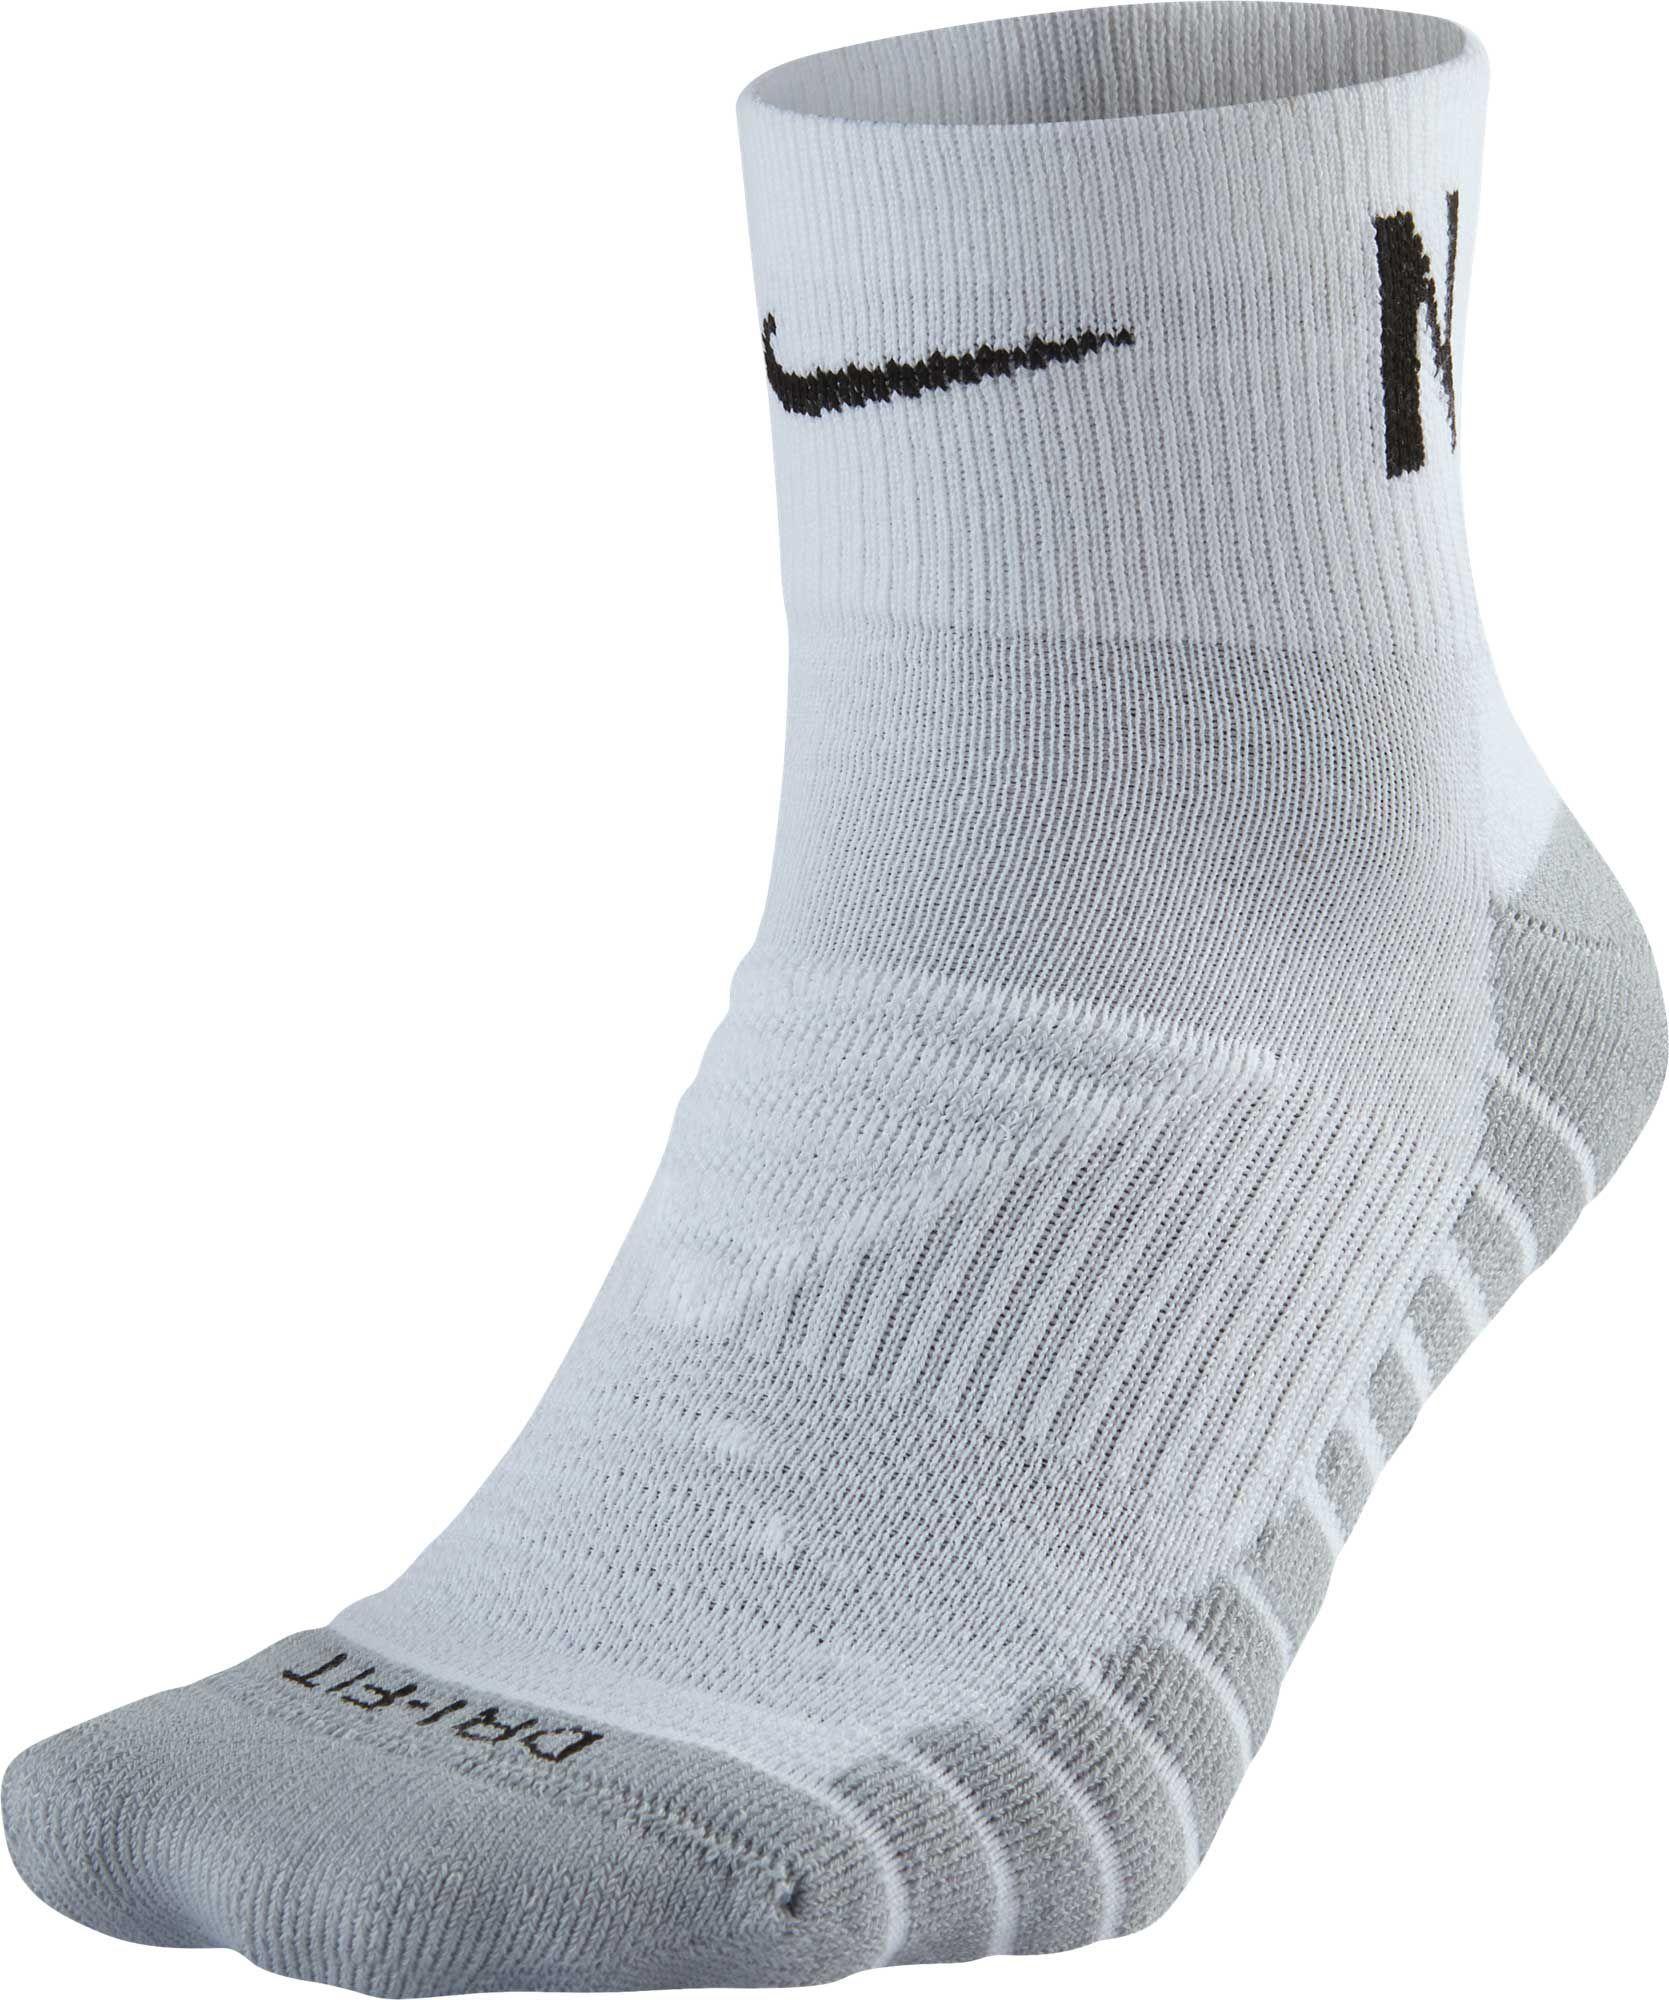 Dri-fit Cushioned Ankle Golf Socks